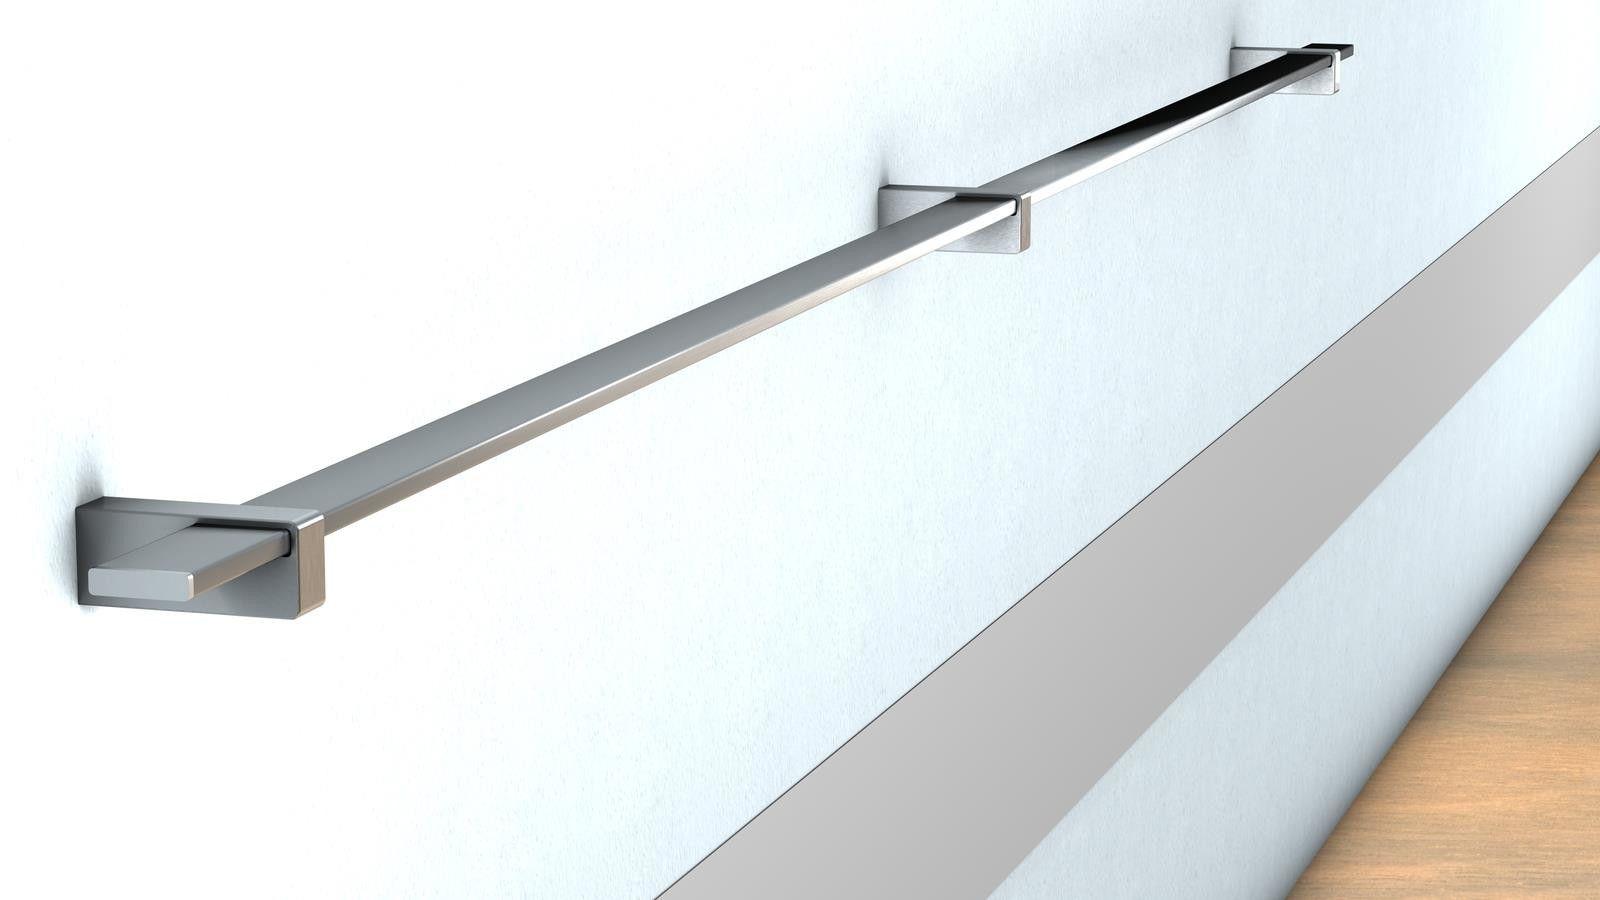 Farbe:Schwarz Edelstahl Handlauf Treppengel/änder Gel/änder Wandhandlauf Wand Treppe 3 Farben 50-200 cm V2Aox L/änge:50 cm